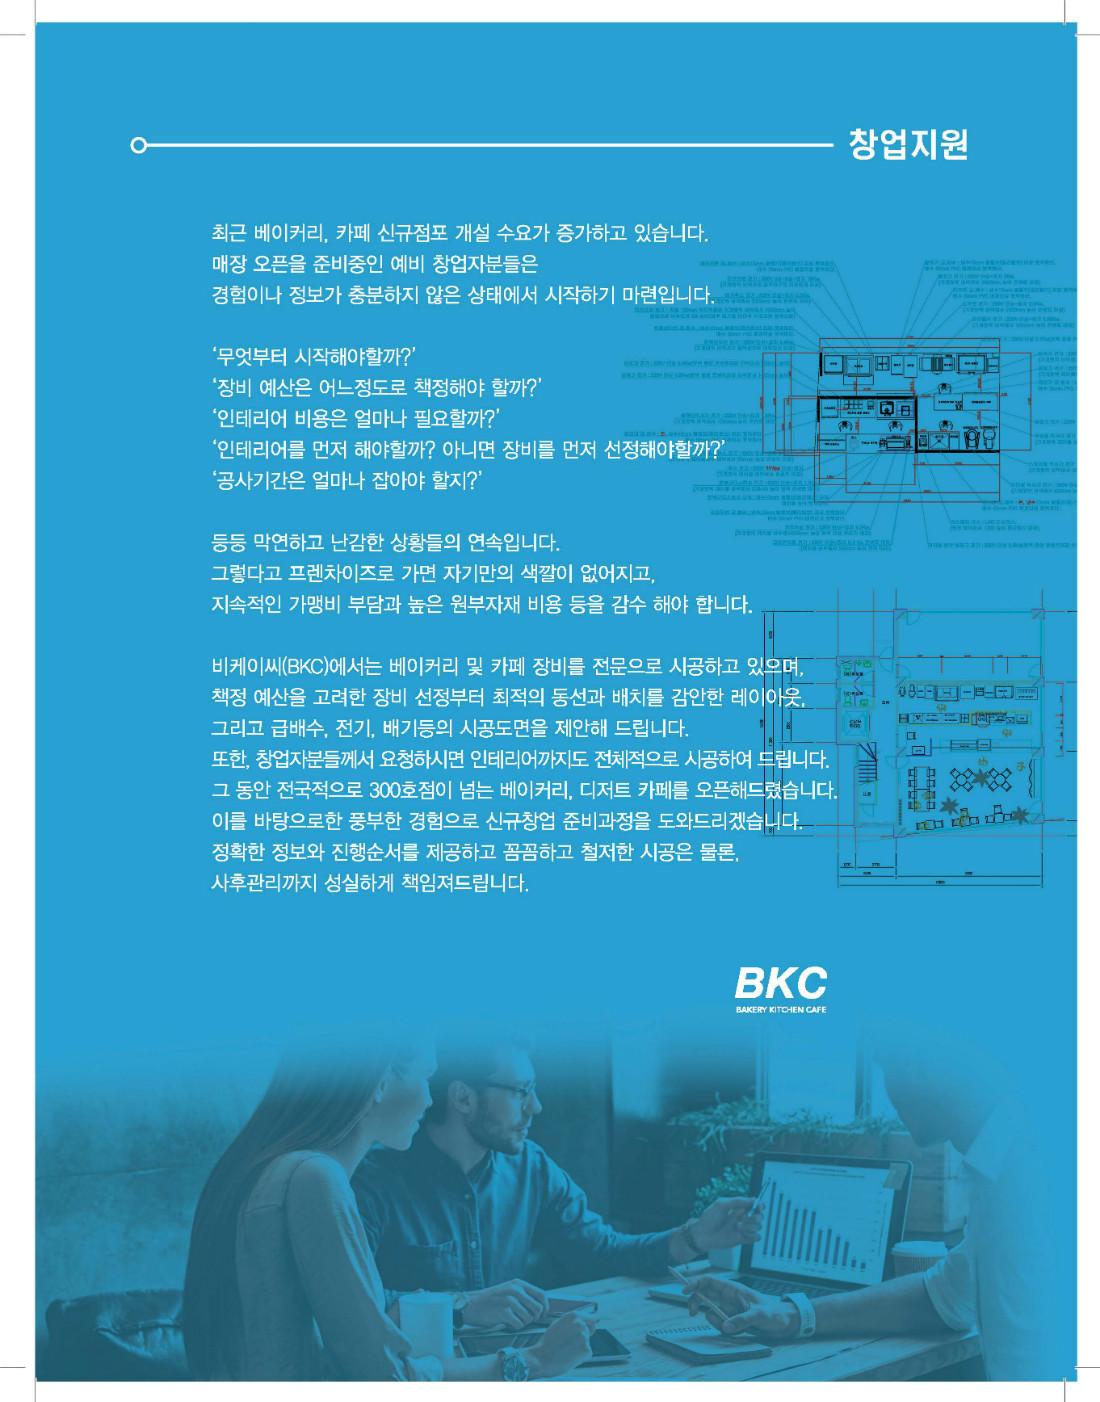 BKC카다로그시안_1105(인쇄용)-16p_페이지_03 - 복사본.jpg